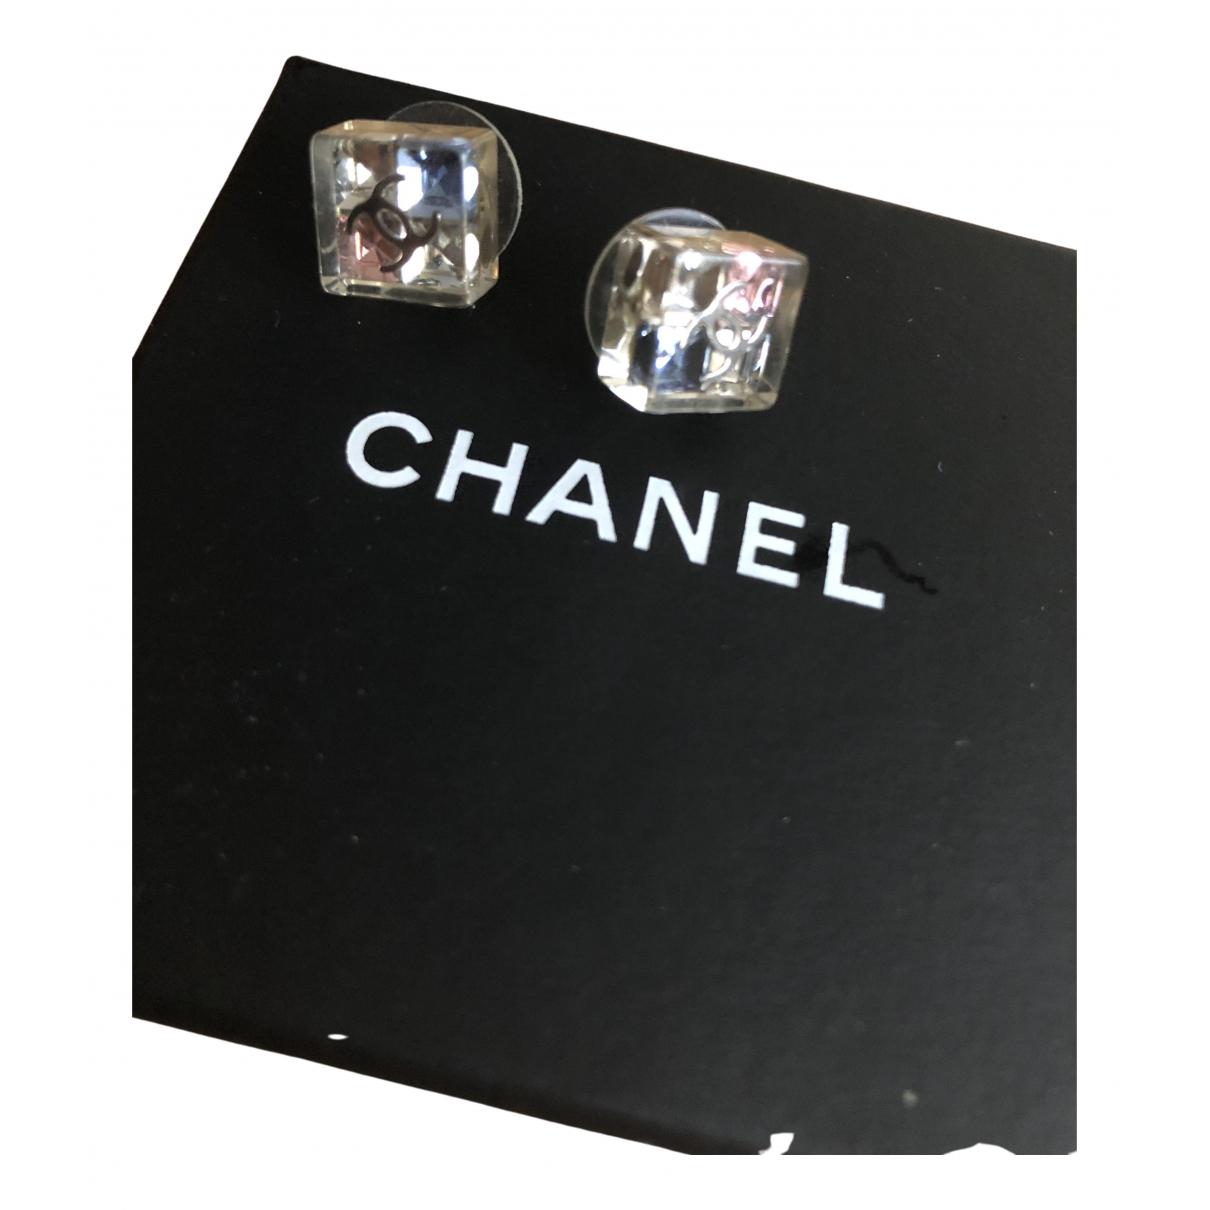 Chanel Matelasse OhrRing in Metall